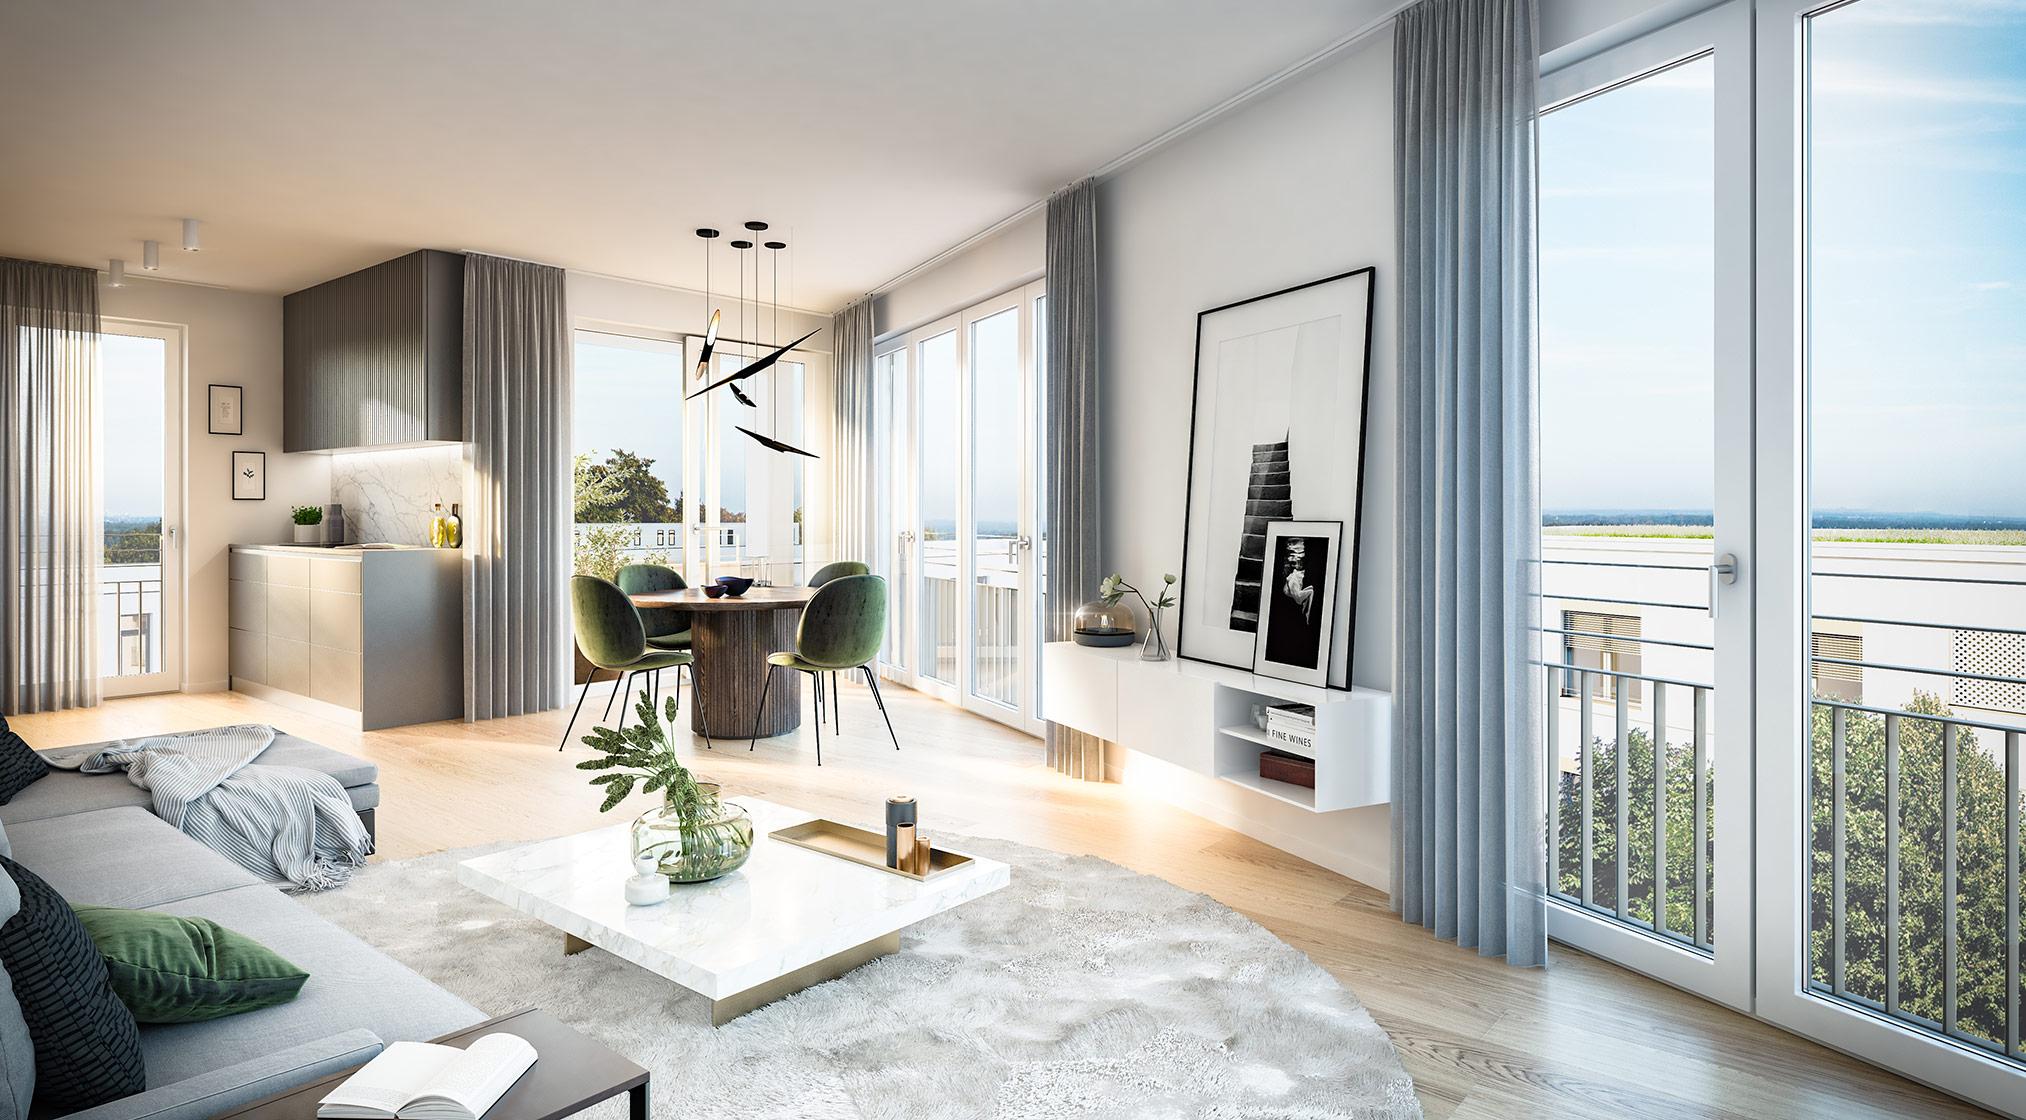 Condominiums Alexisquartier - Das Duett - Project details - illustration 5